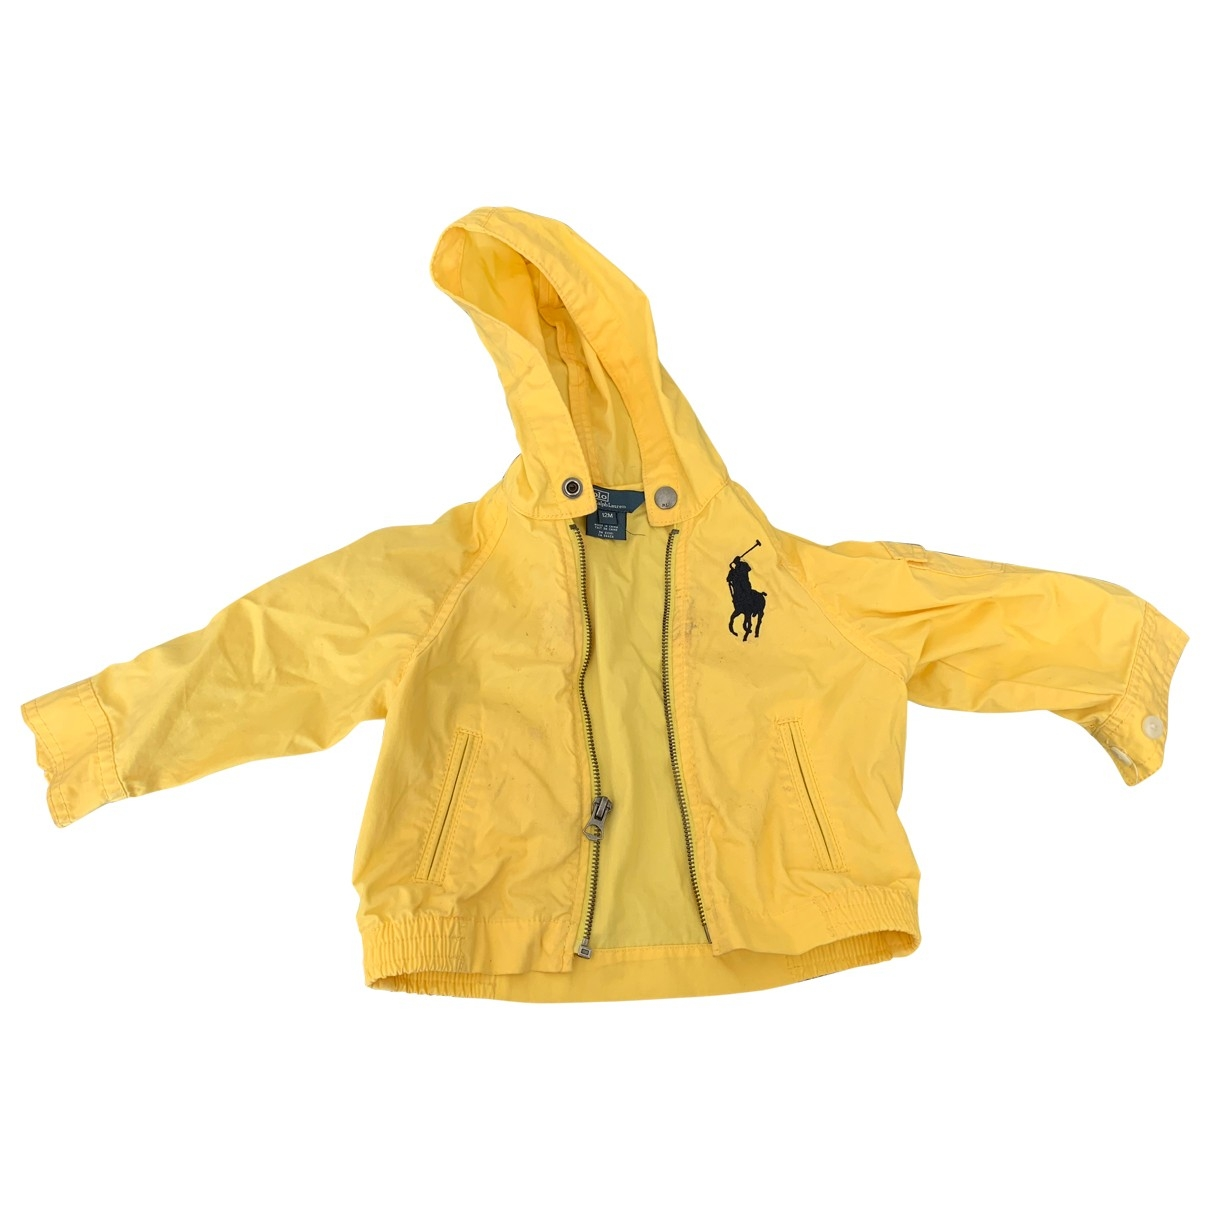 Polo Ralph Lauren \N Jacke, Maentel in  Gelb Polyester